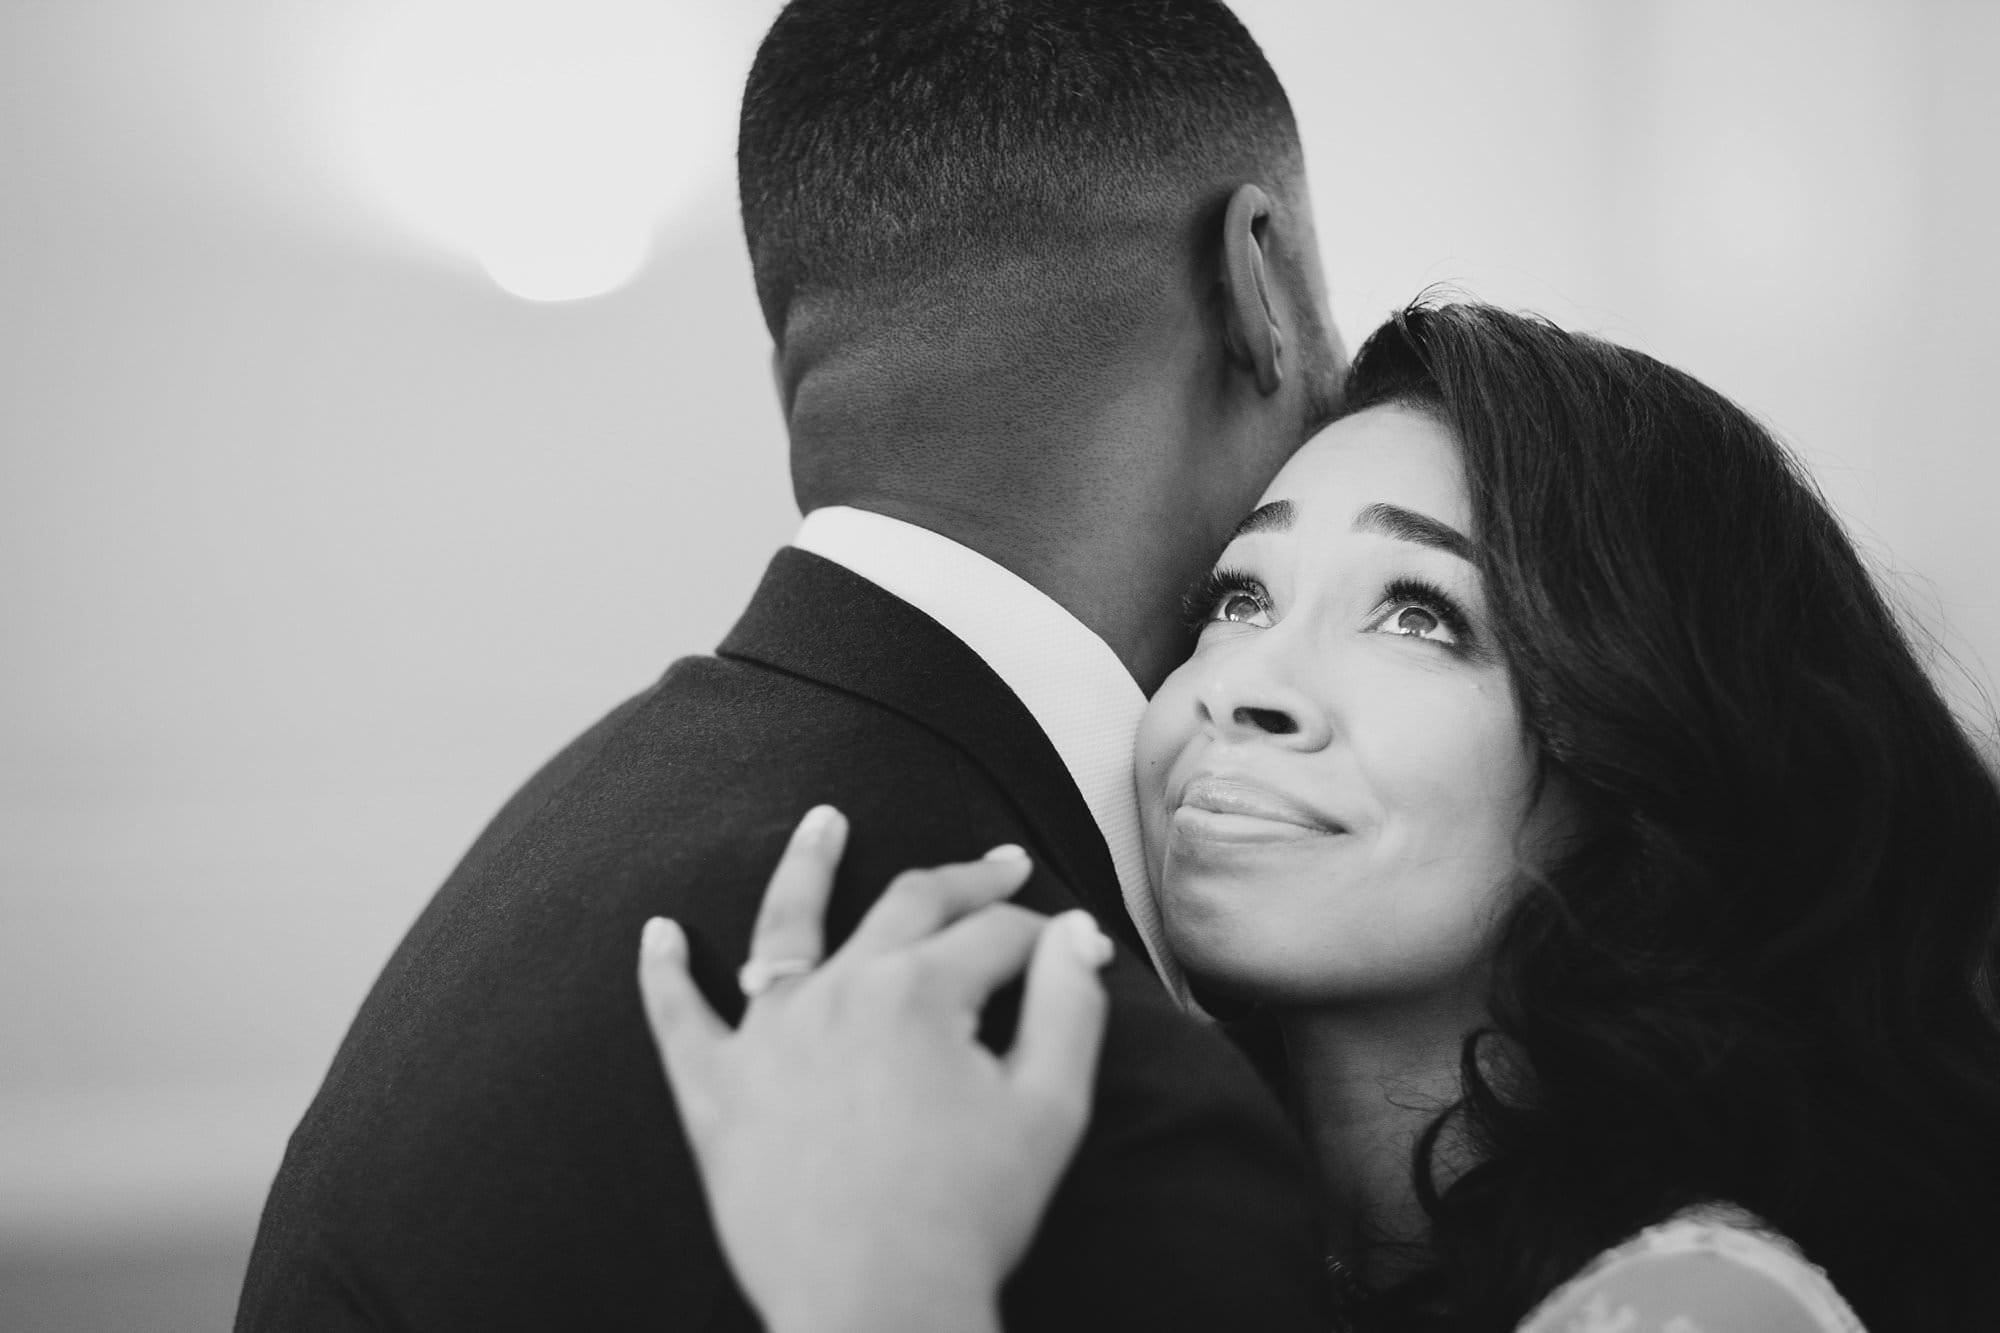 asia house london wedding photographer 025 - Rachel + Gabriel   Asia House Wedding Photography